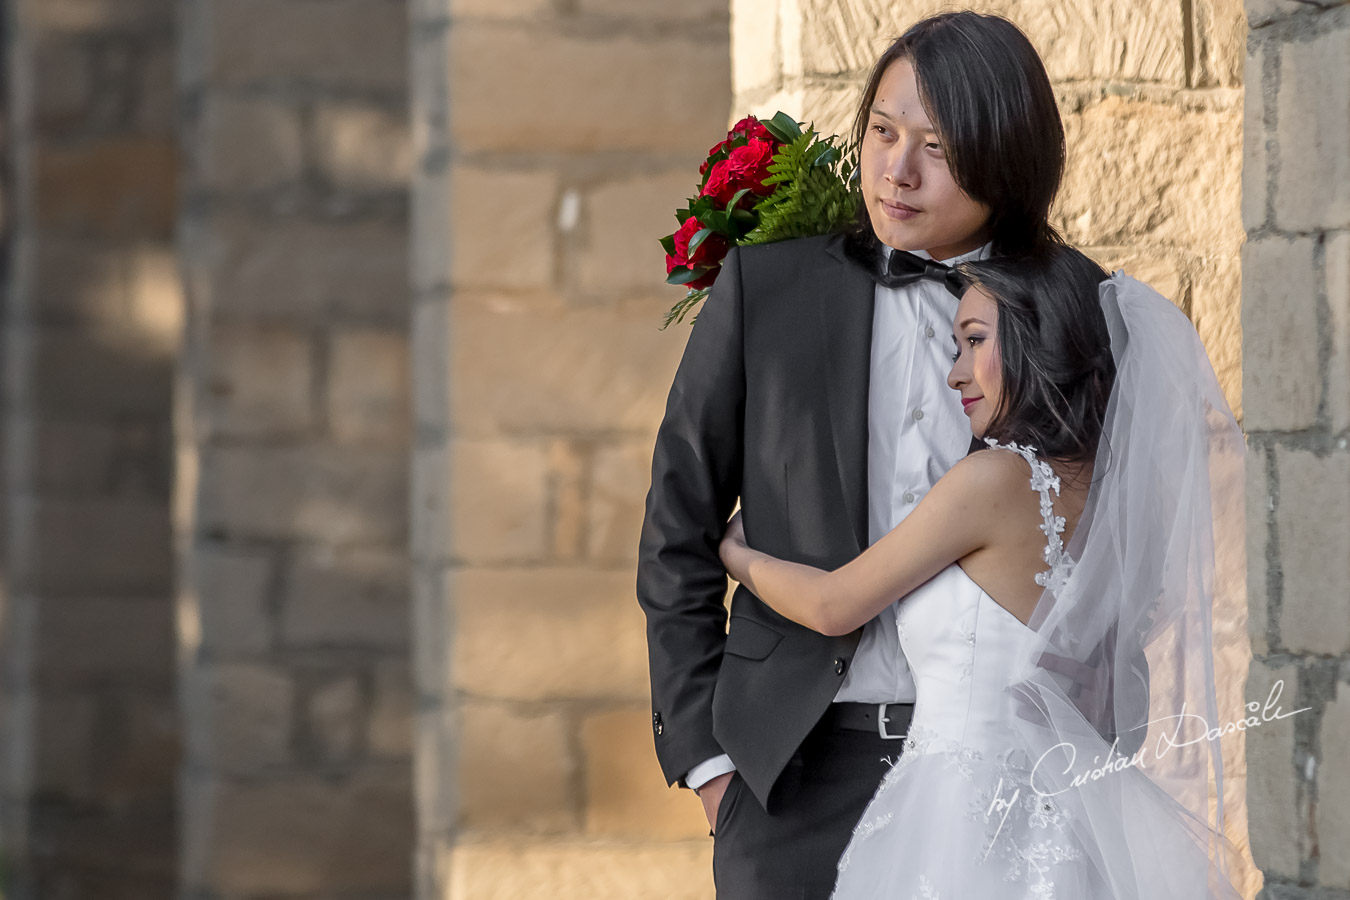 Pre Wedding Photoshoot in Cyprus - 07